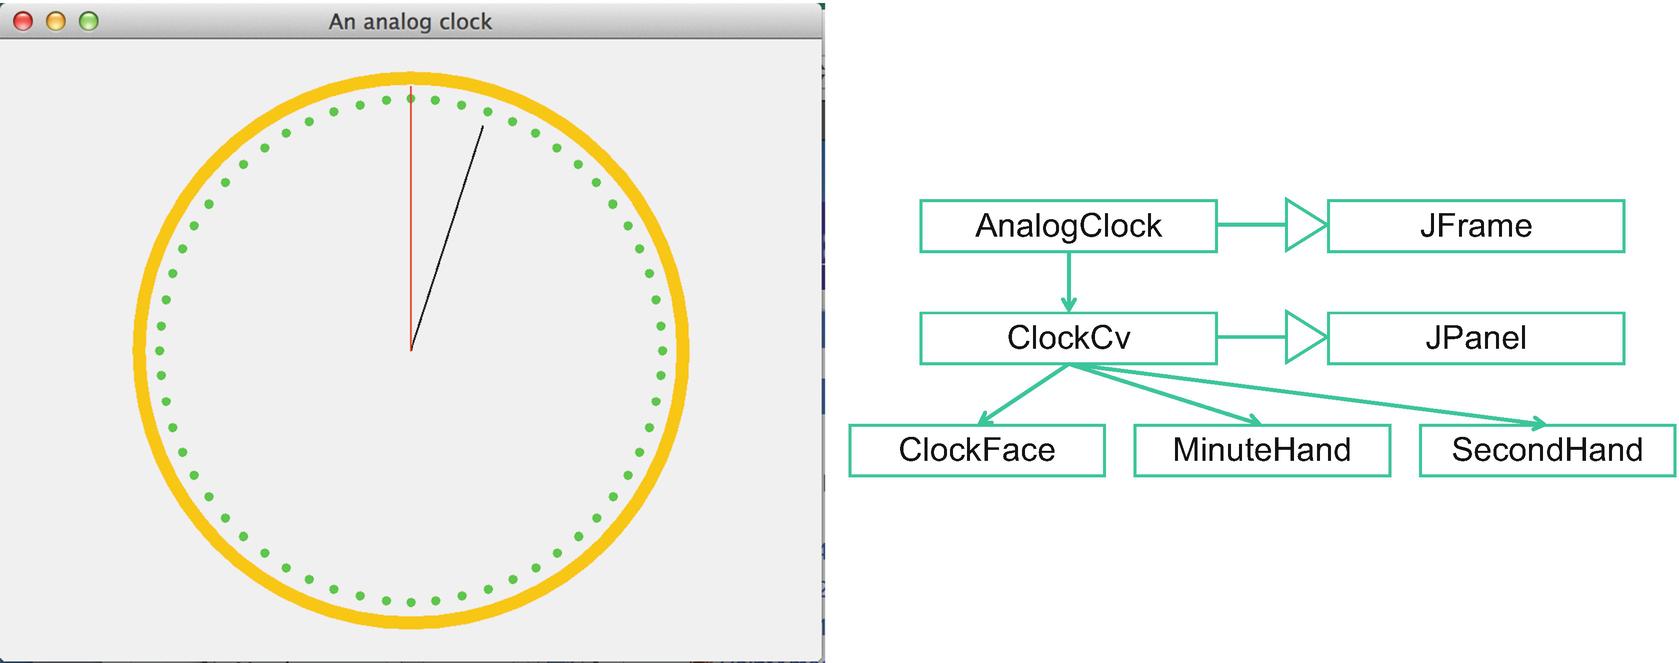 Animation Programming: A Digital Clock and an Analog Clock